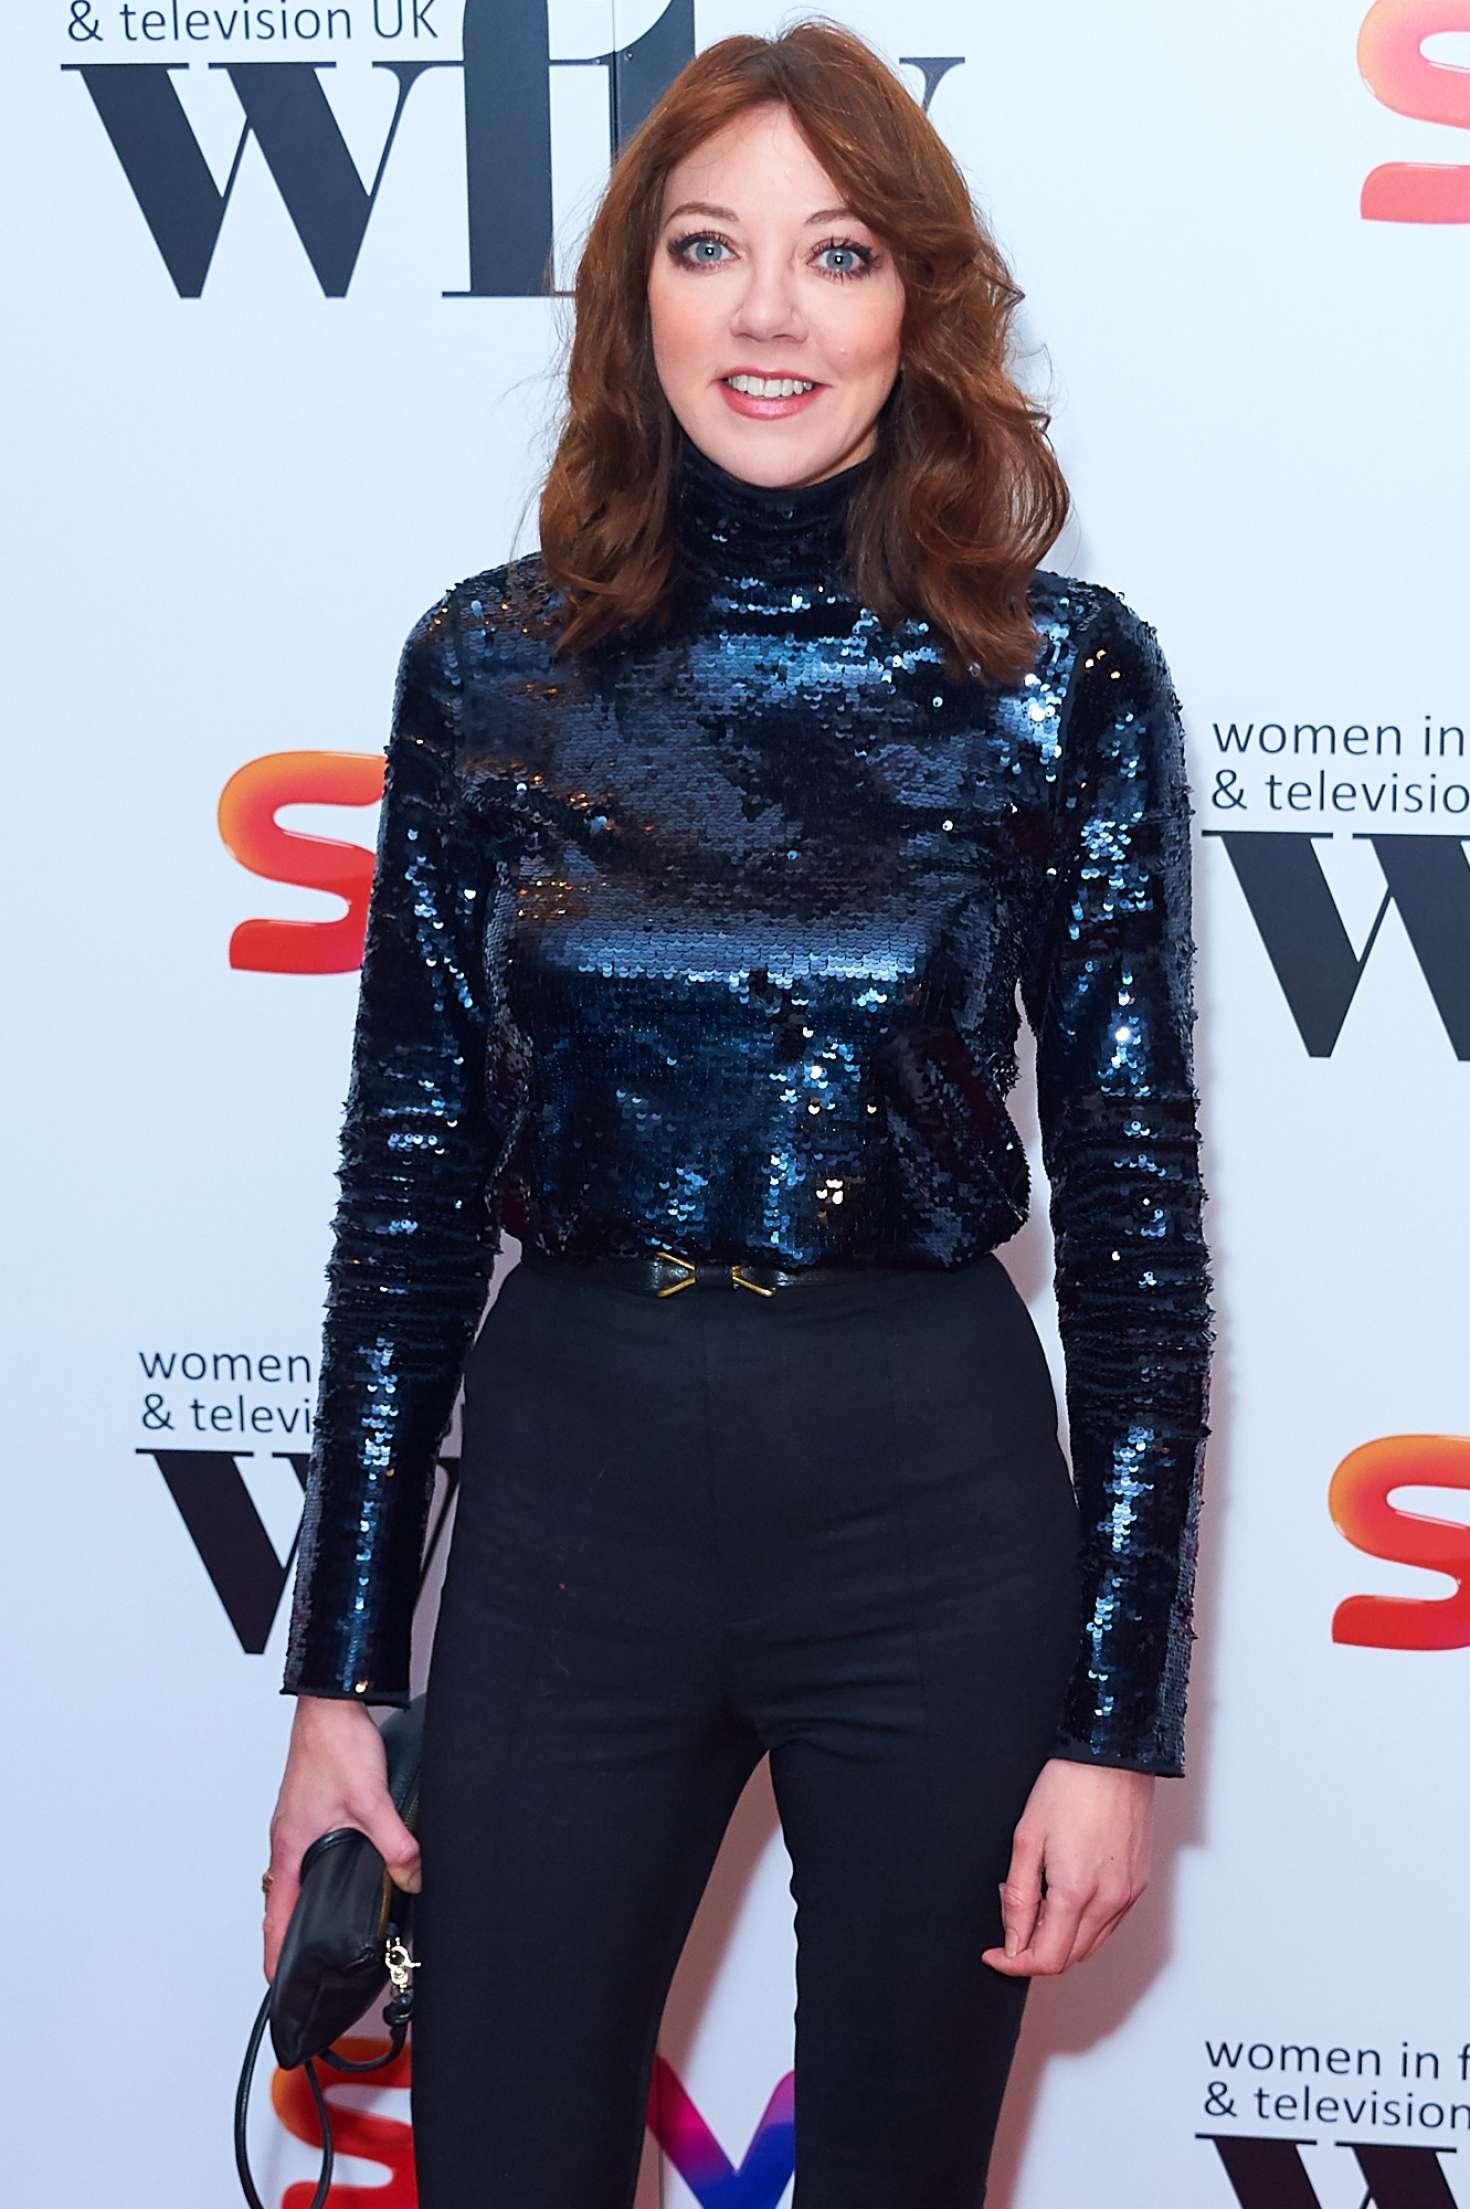 Diane Morgan Sky Women In Film And Tv Awards 2017 In London